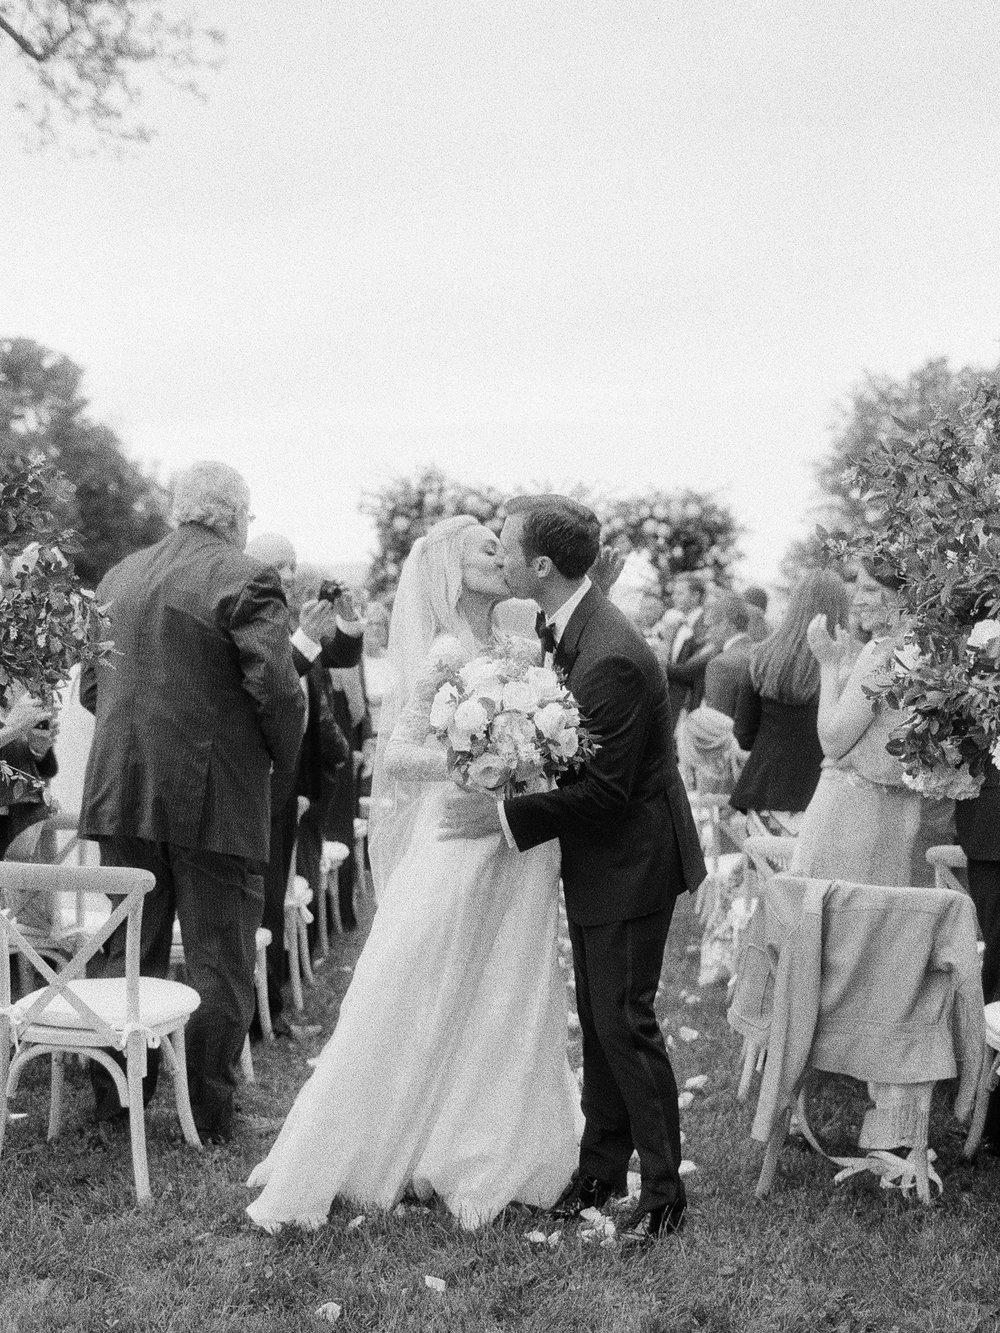 Ankony_Farm_Wedding-117-Jen-Huang-AS-629-Jen-Huang-000013180028.jpg